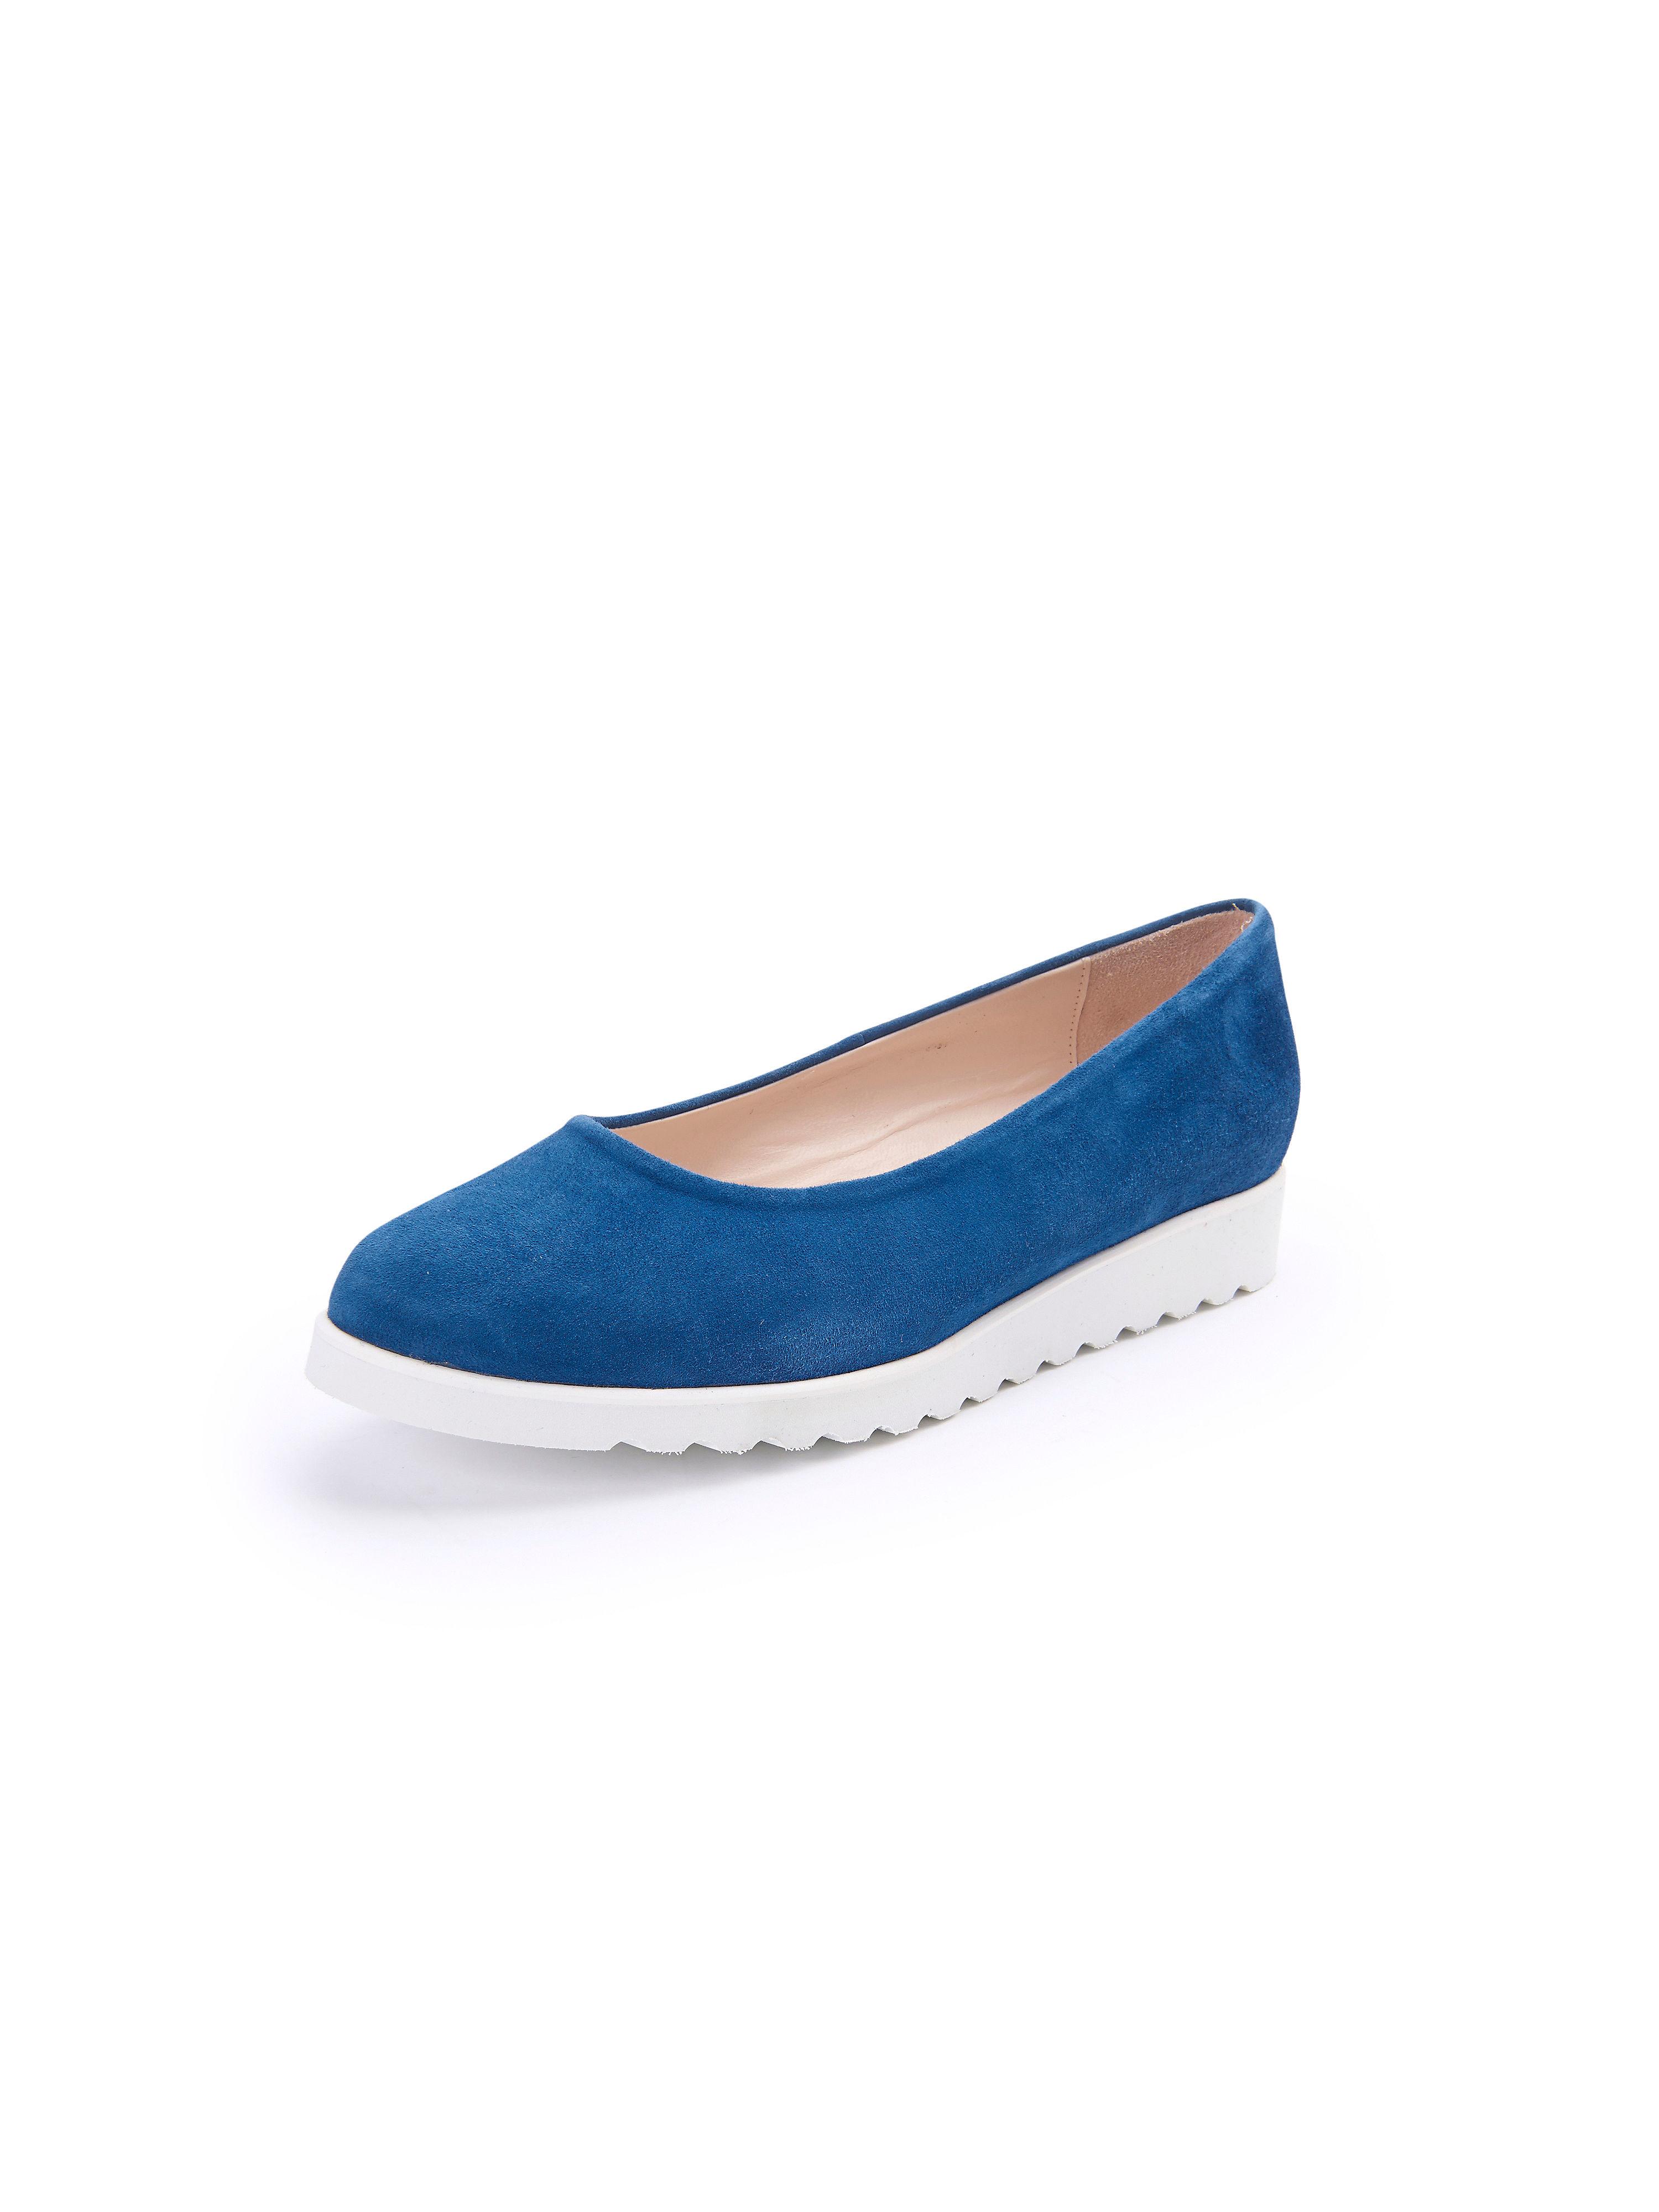 Les ballerines cuir - modèle Scarpio Scarpio bleu taille 36